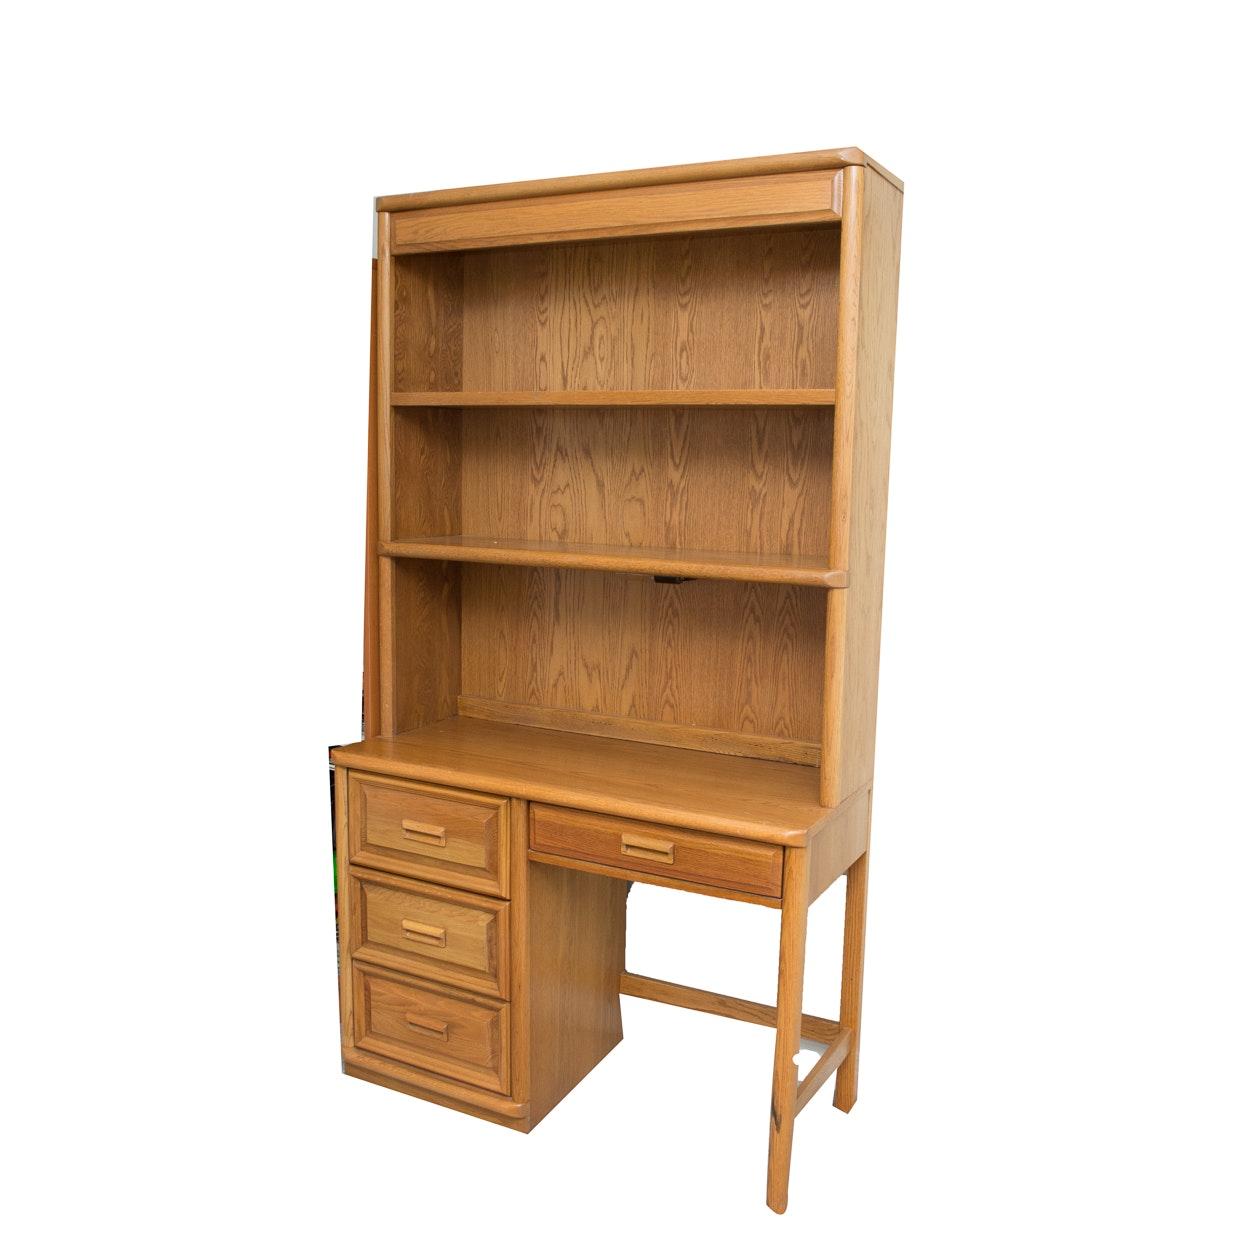 Lexington Oak Student Desk and Hutch